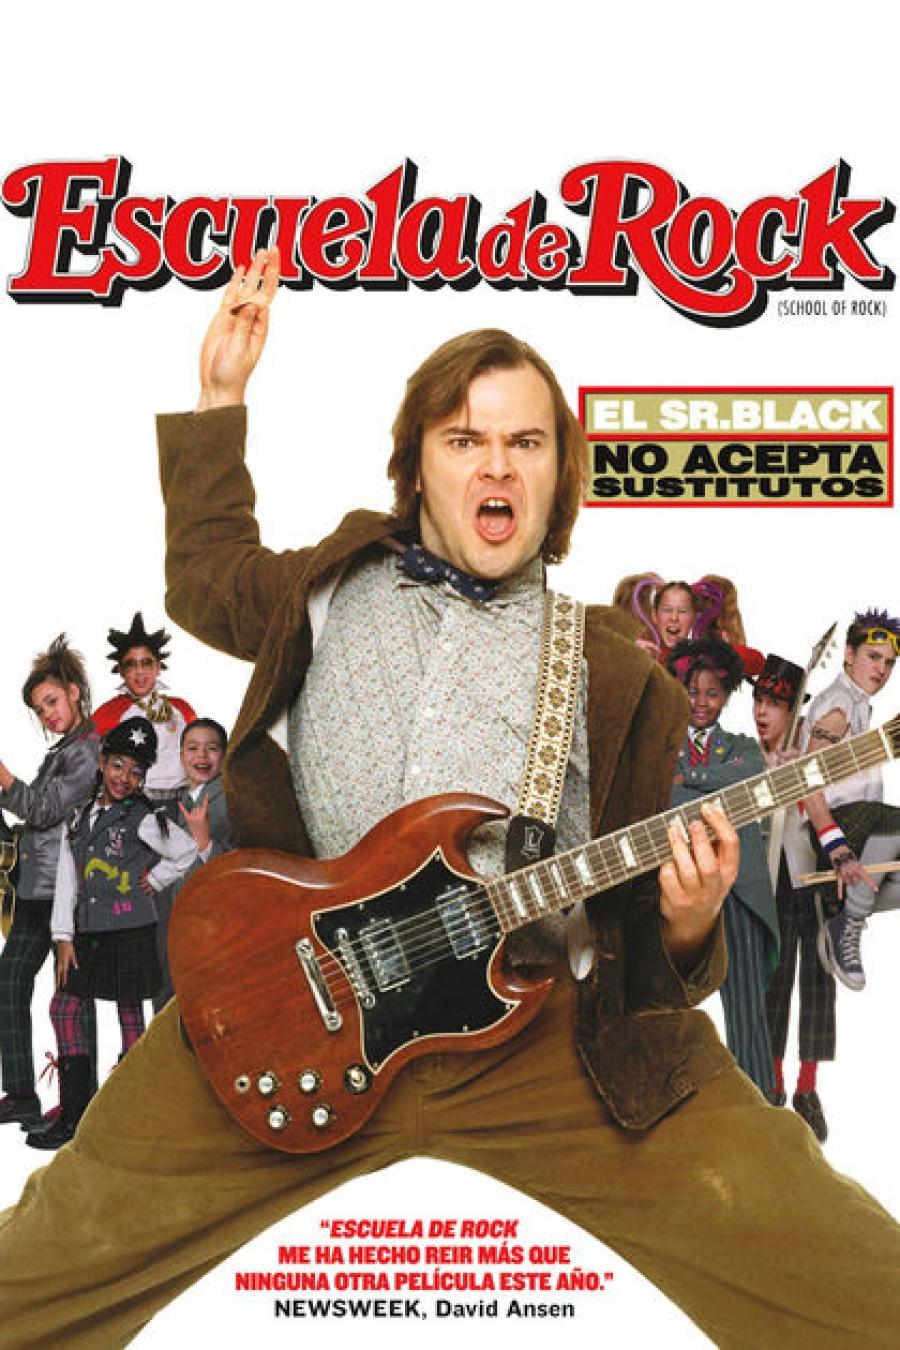 TSchool of Rock